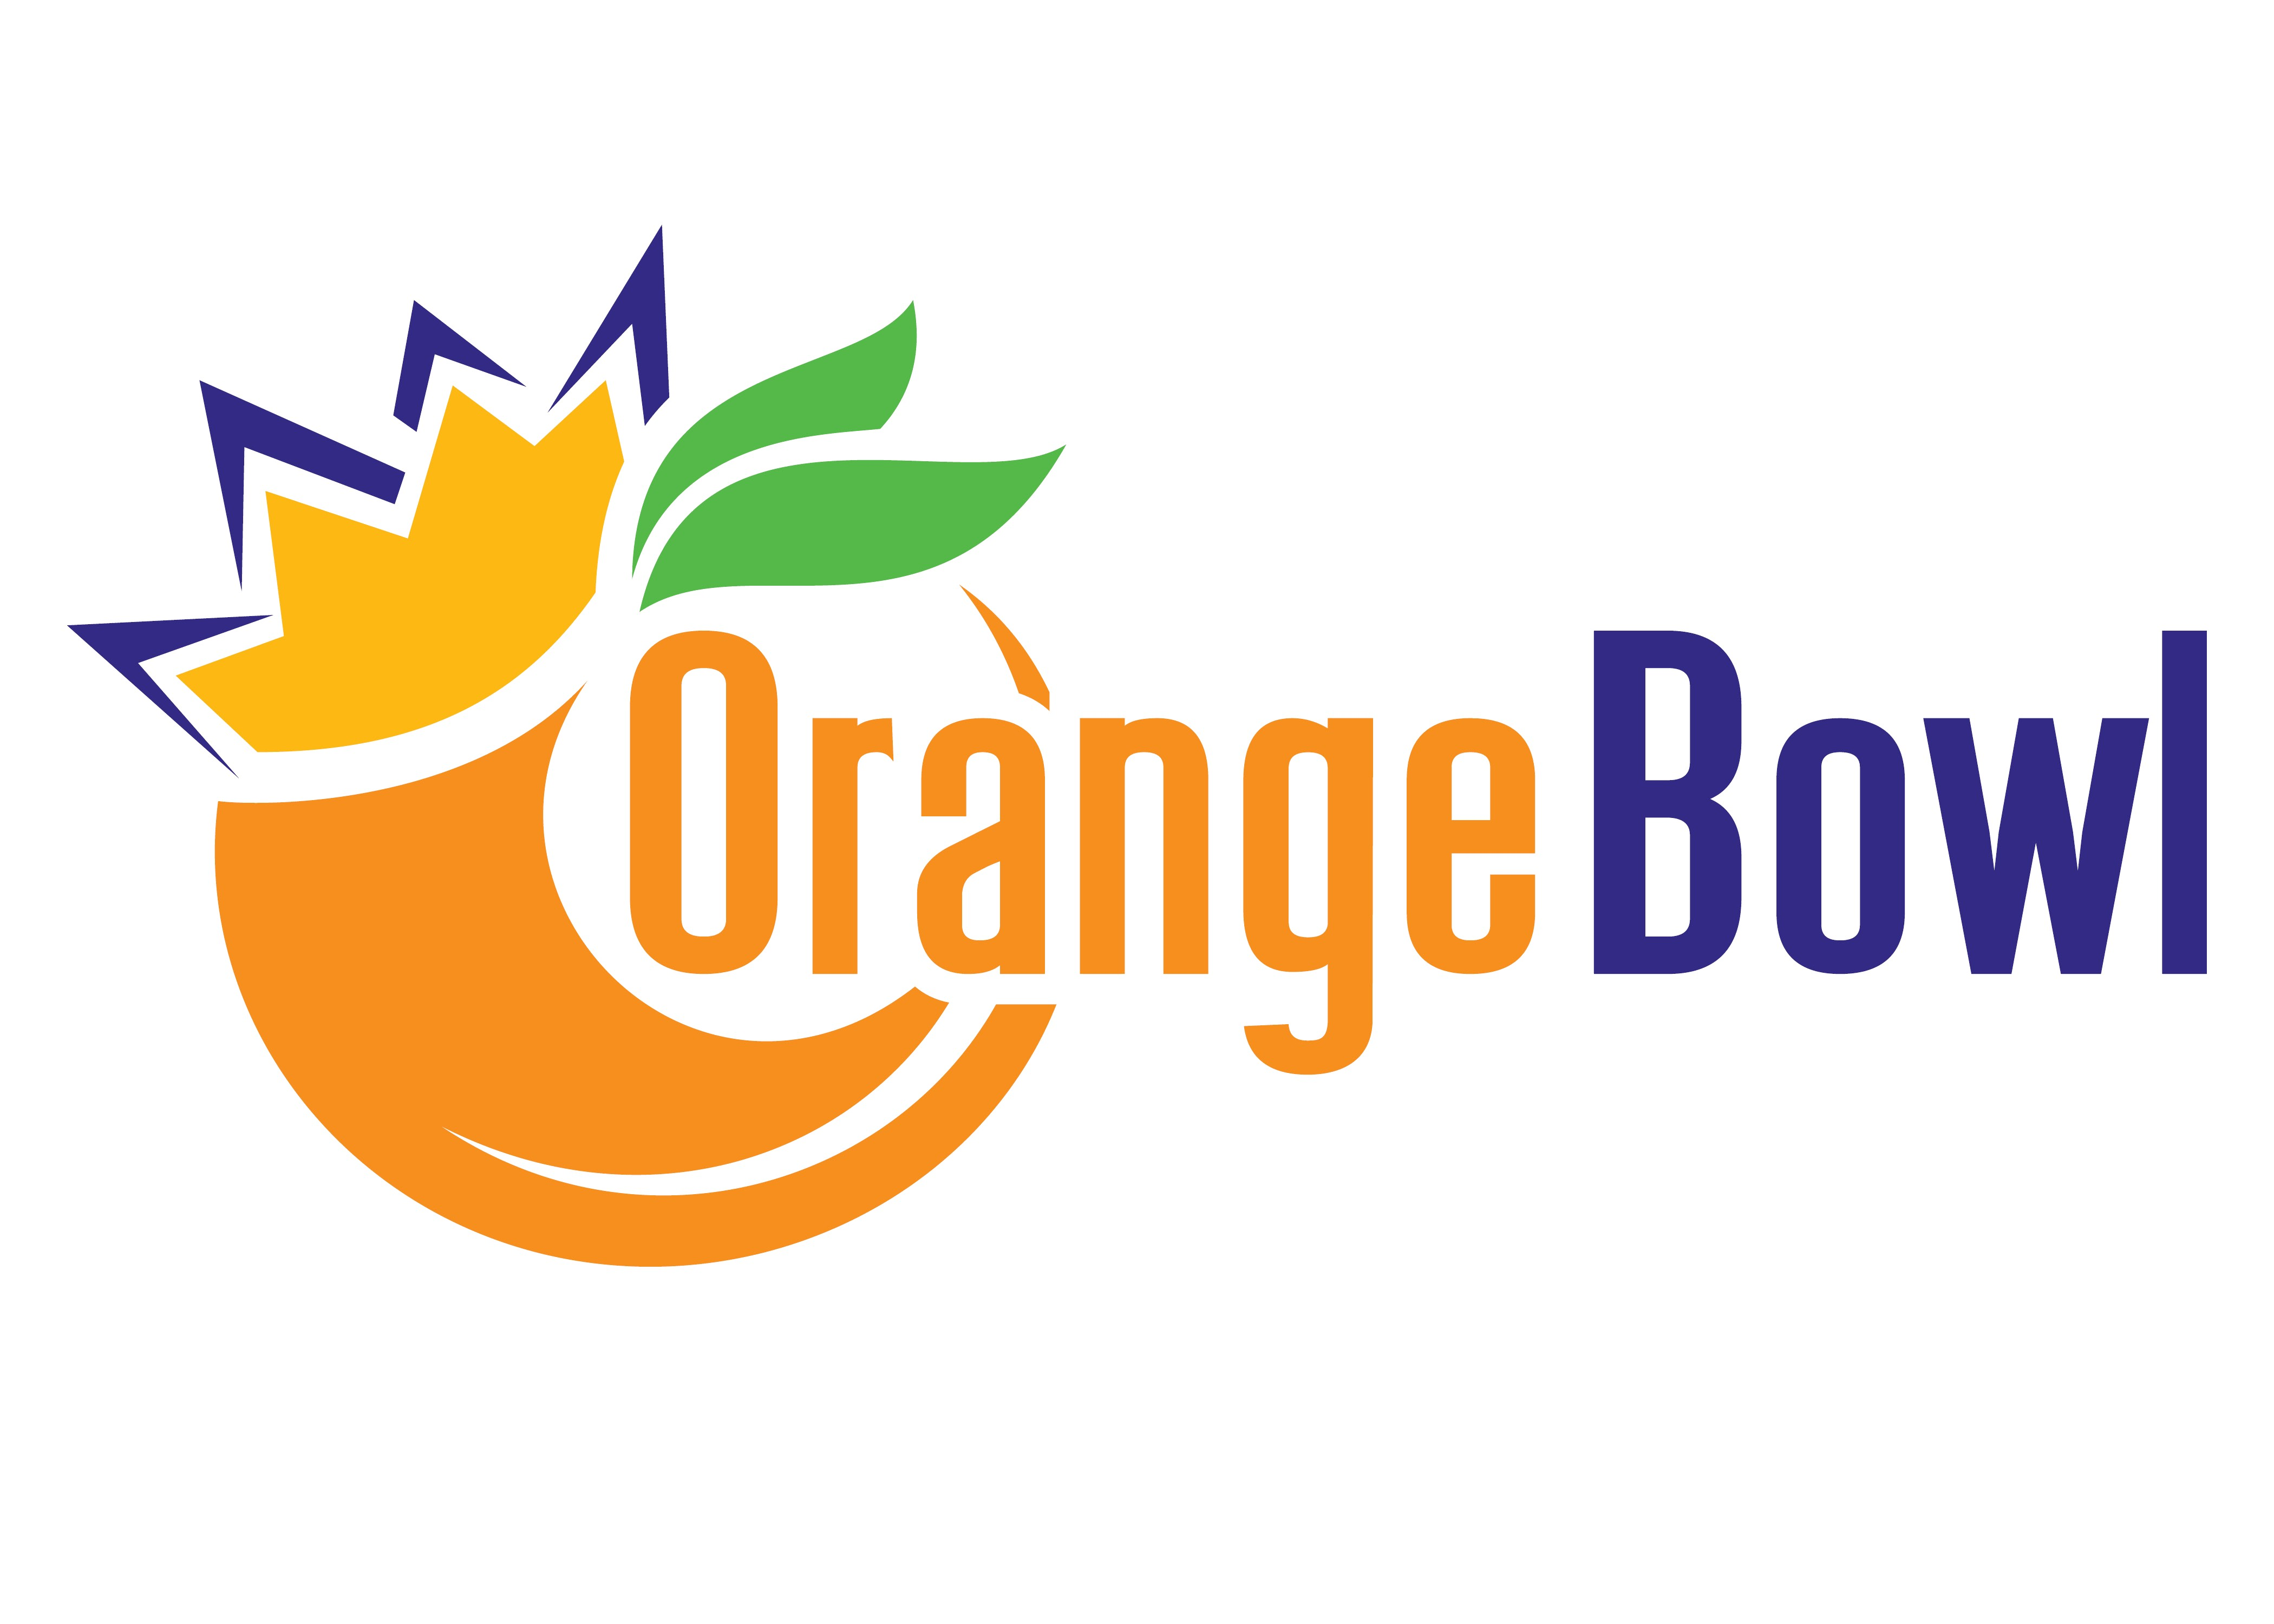 Calendario 2019 atp Actual Junior orange Bowl What We Do Sports Tennis Of Calendario 2019 atp Recientes atp Challenger tour atp tour